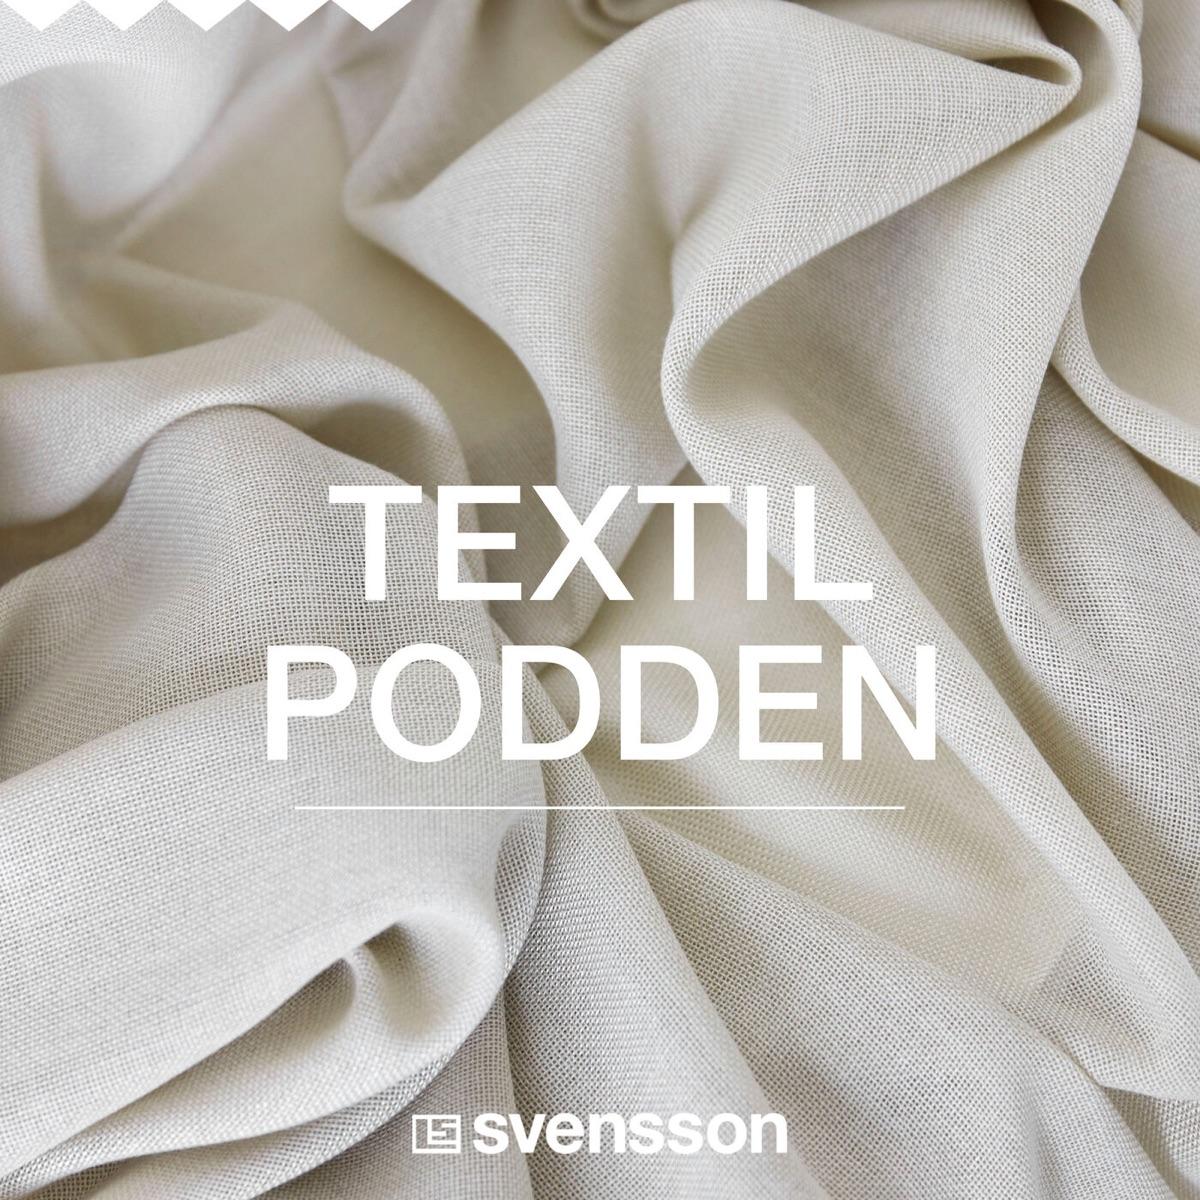 Textilpodden